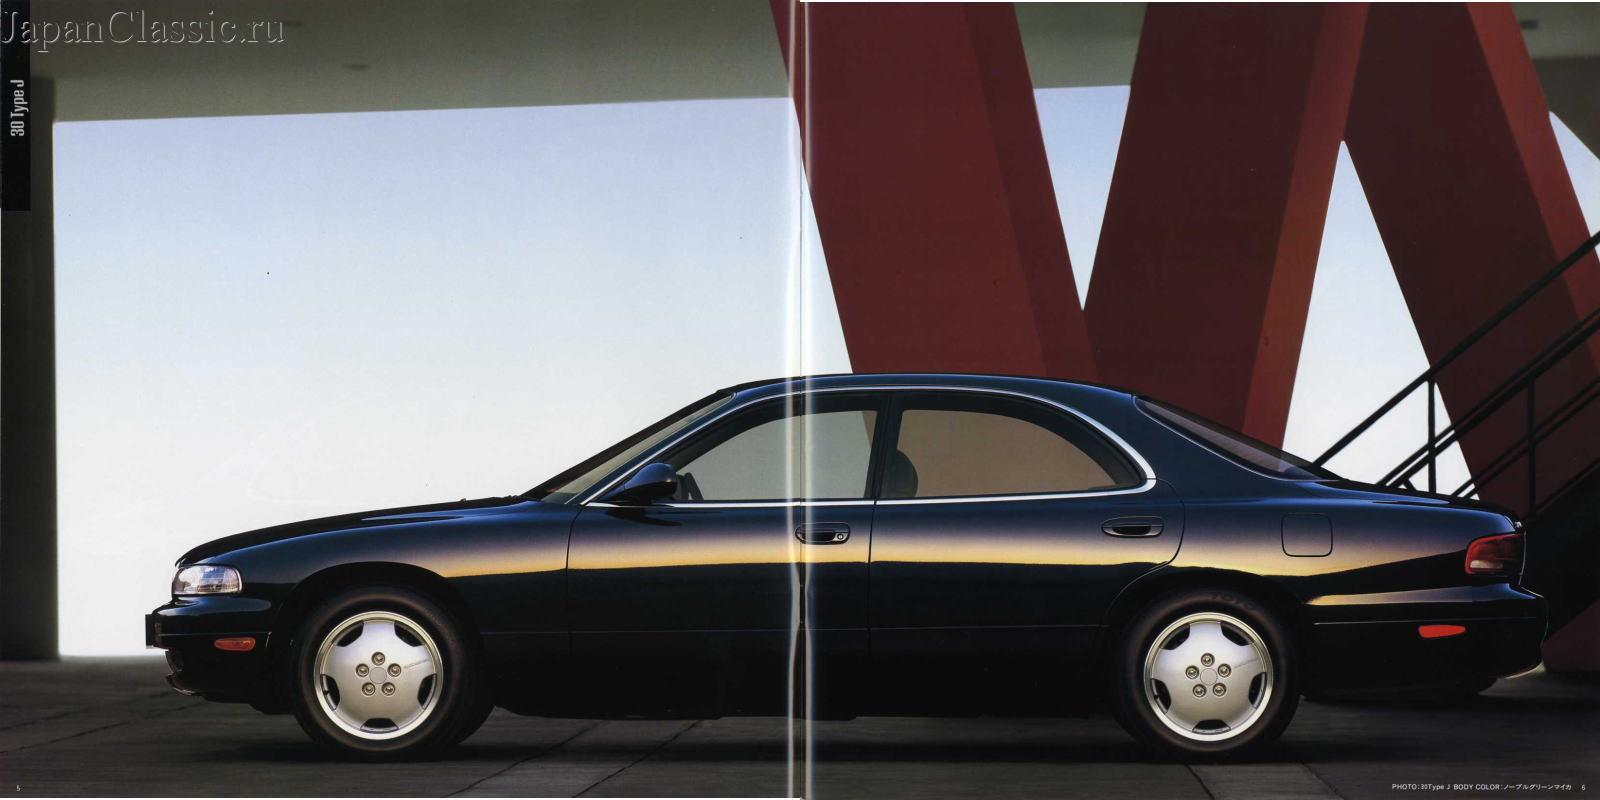 Mazda sentia 1993 hd japanclassic